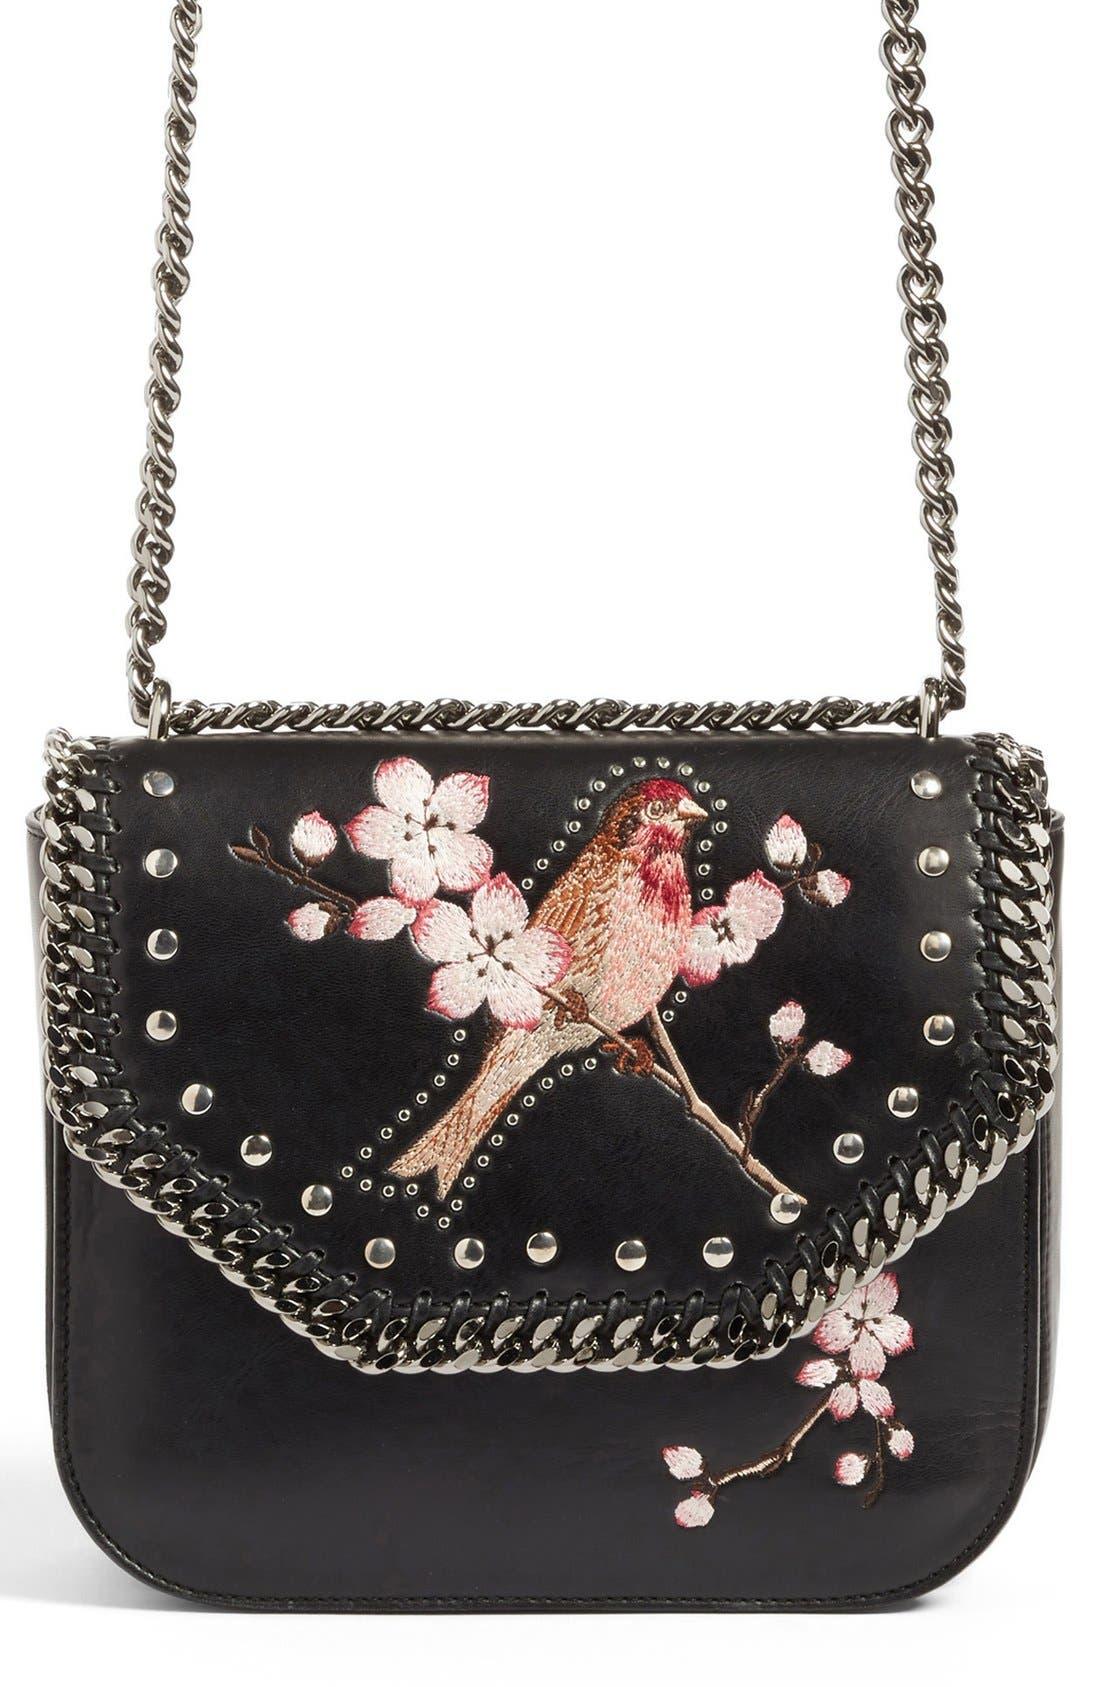 STELLA MCCARTNEY Black Falabella Box Bird Shoulder Bag